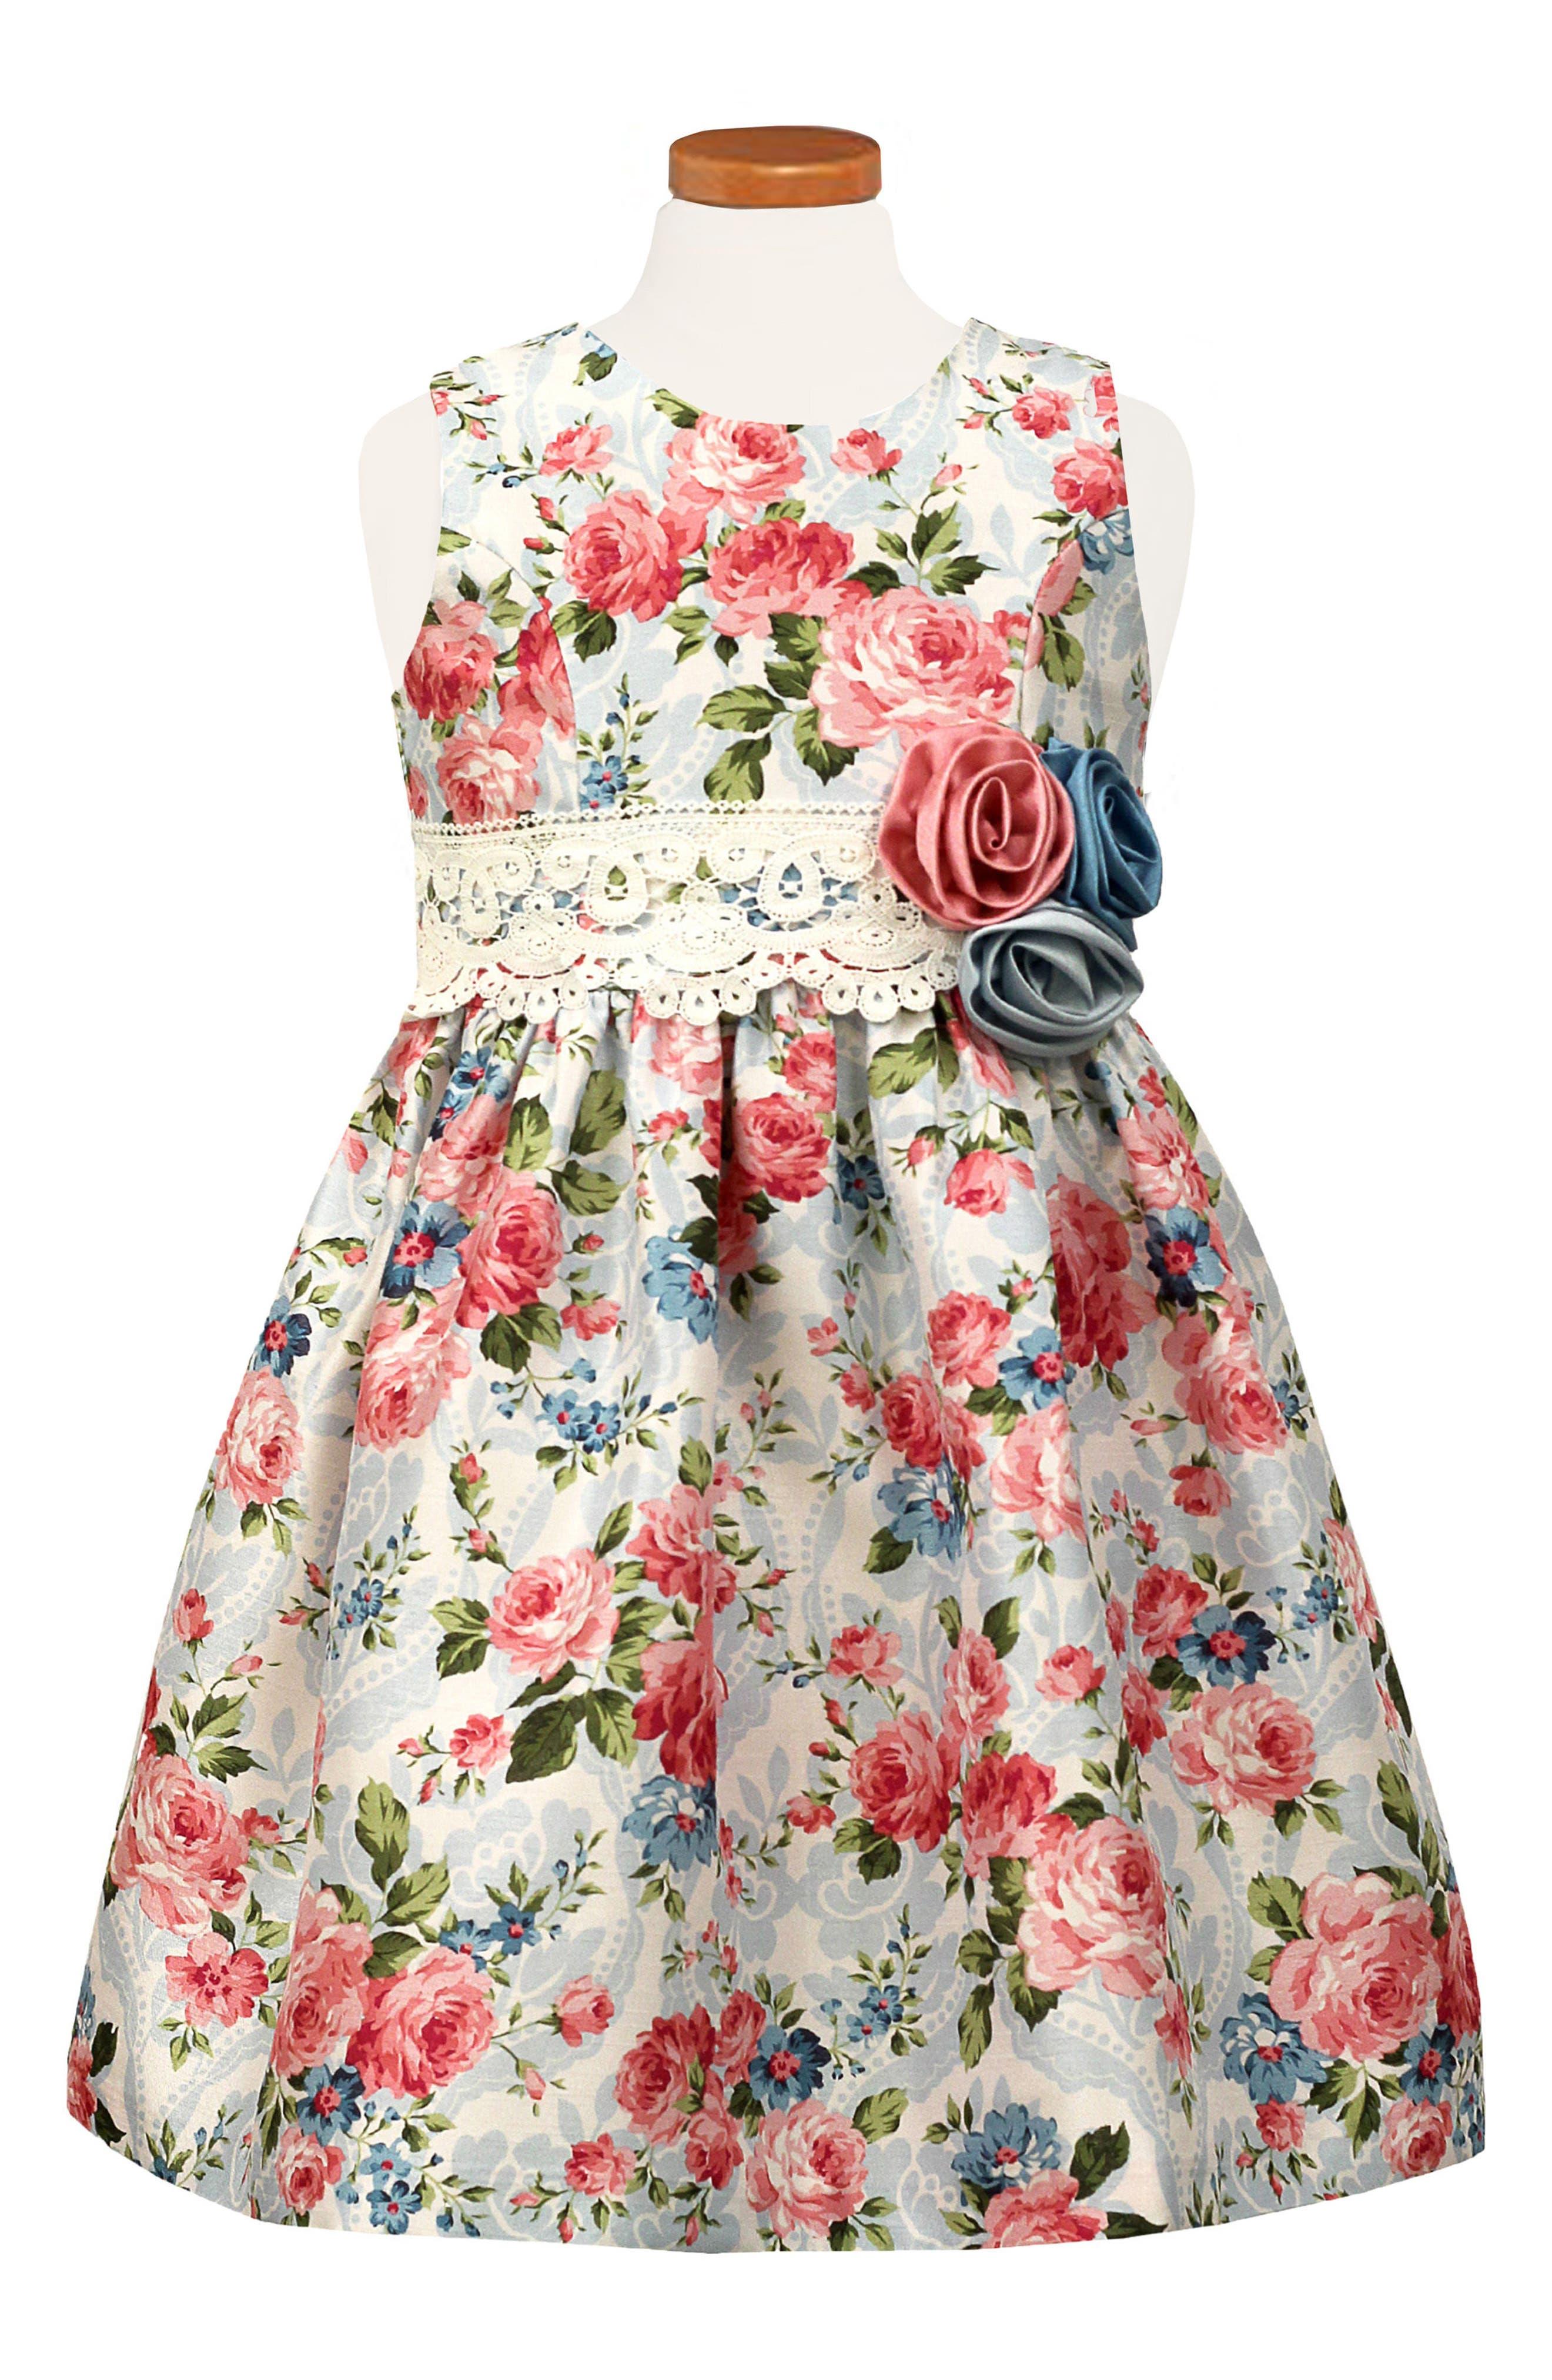 Main Image - Sorbet Floral Party Dress (Toddler Girls & Little Girls)